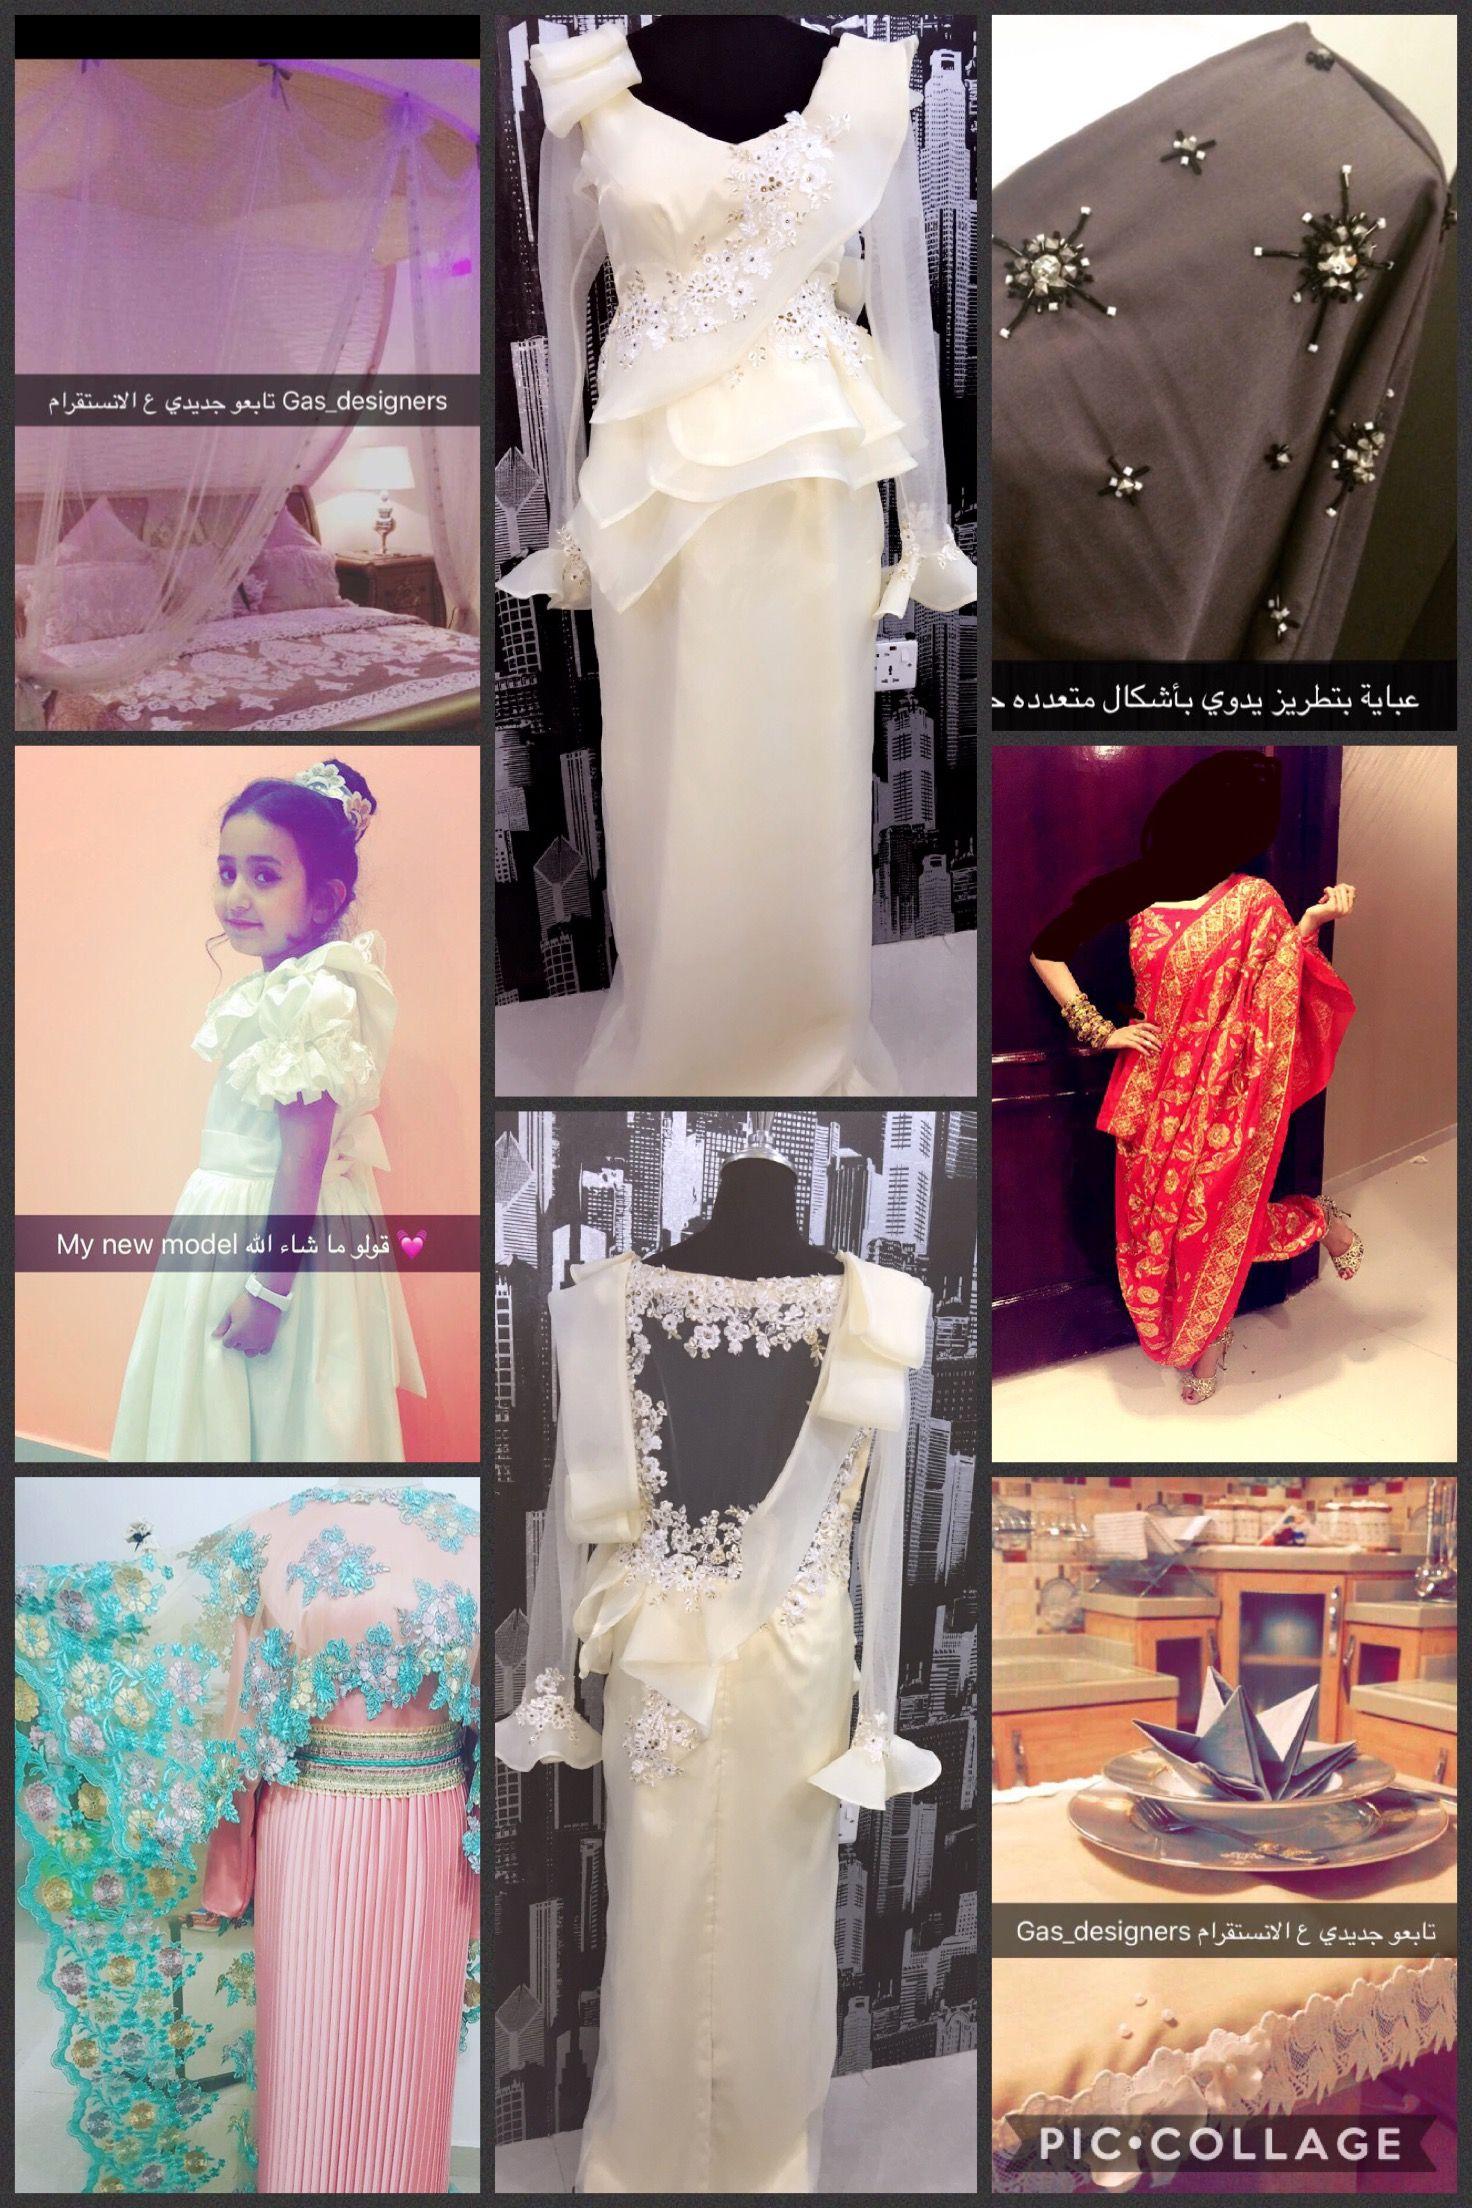 eaf69312b96cb معلومات عن الاإعلان   معمل غفران سندي للخياطة النسائية في المدينة المنورة  لتصميم و خياطة جميع